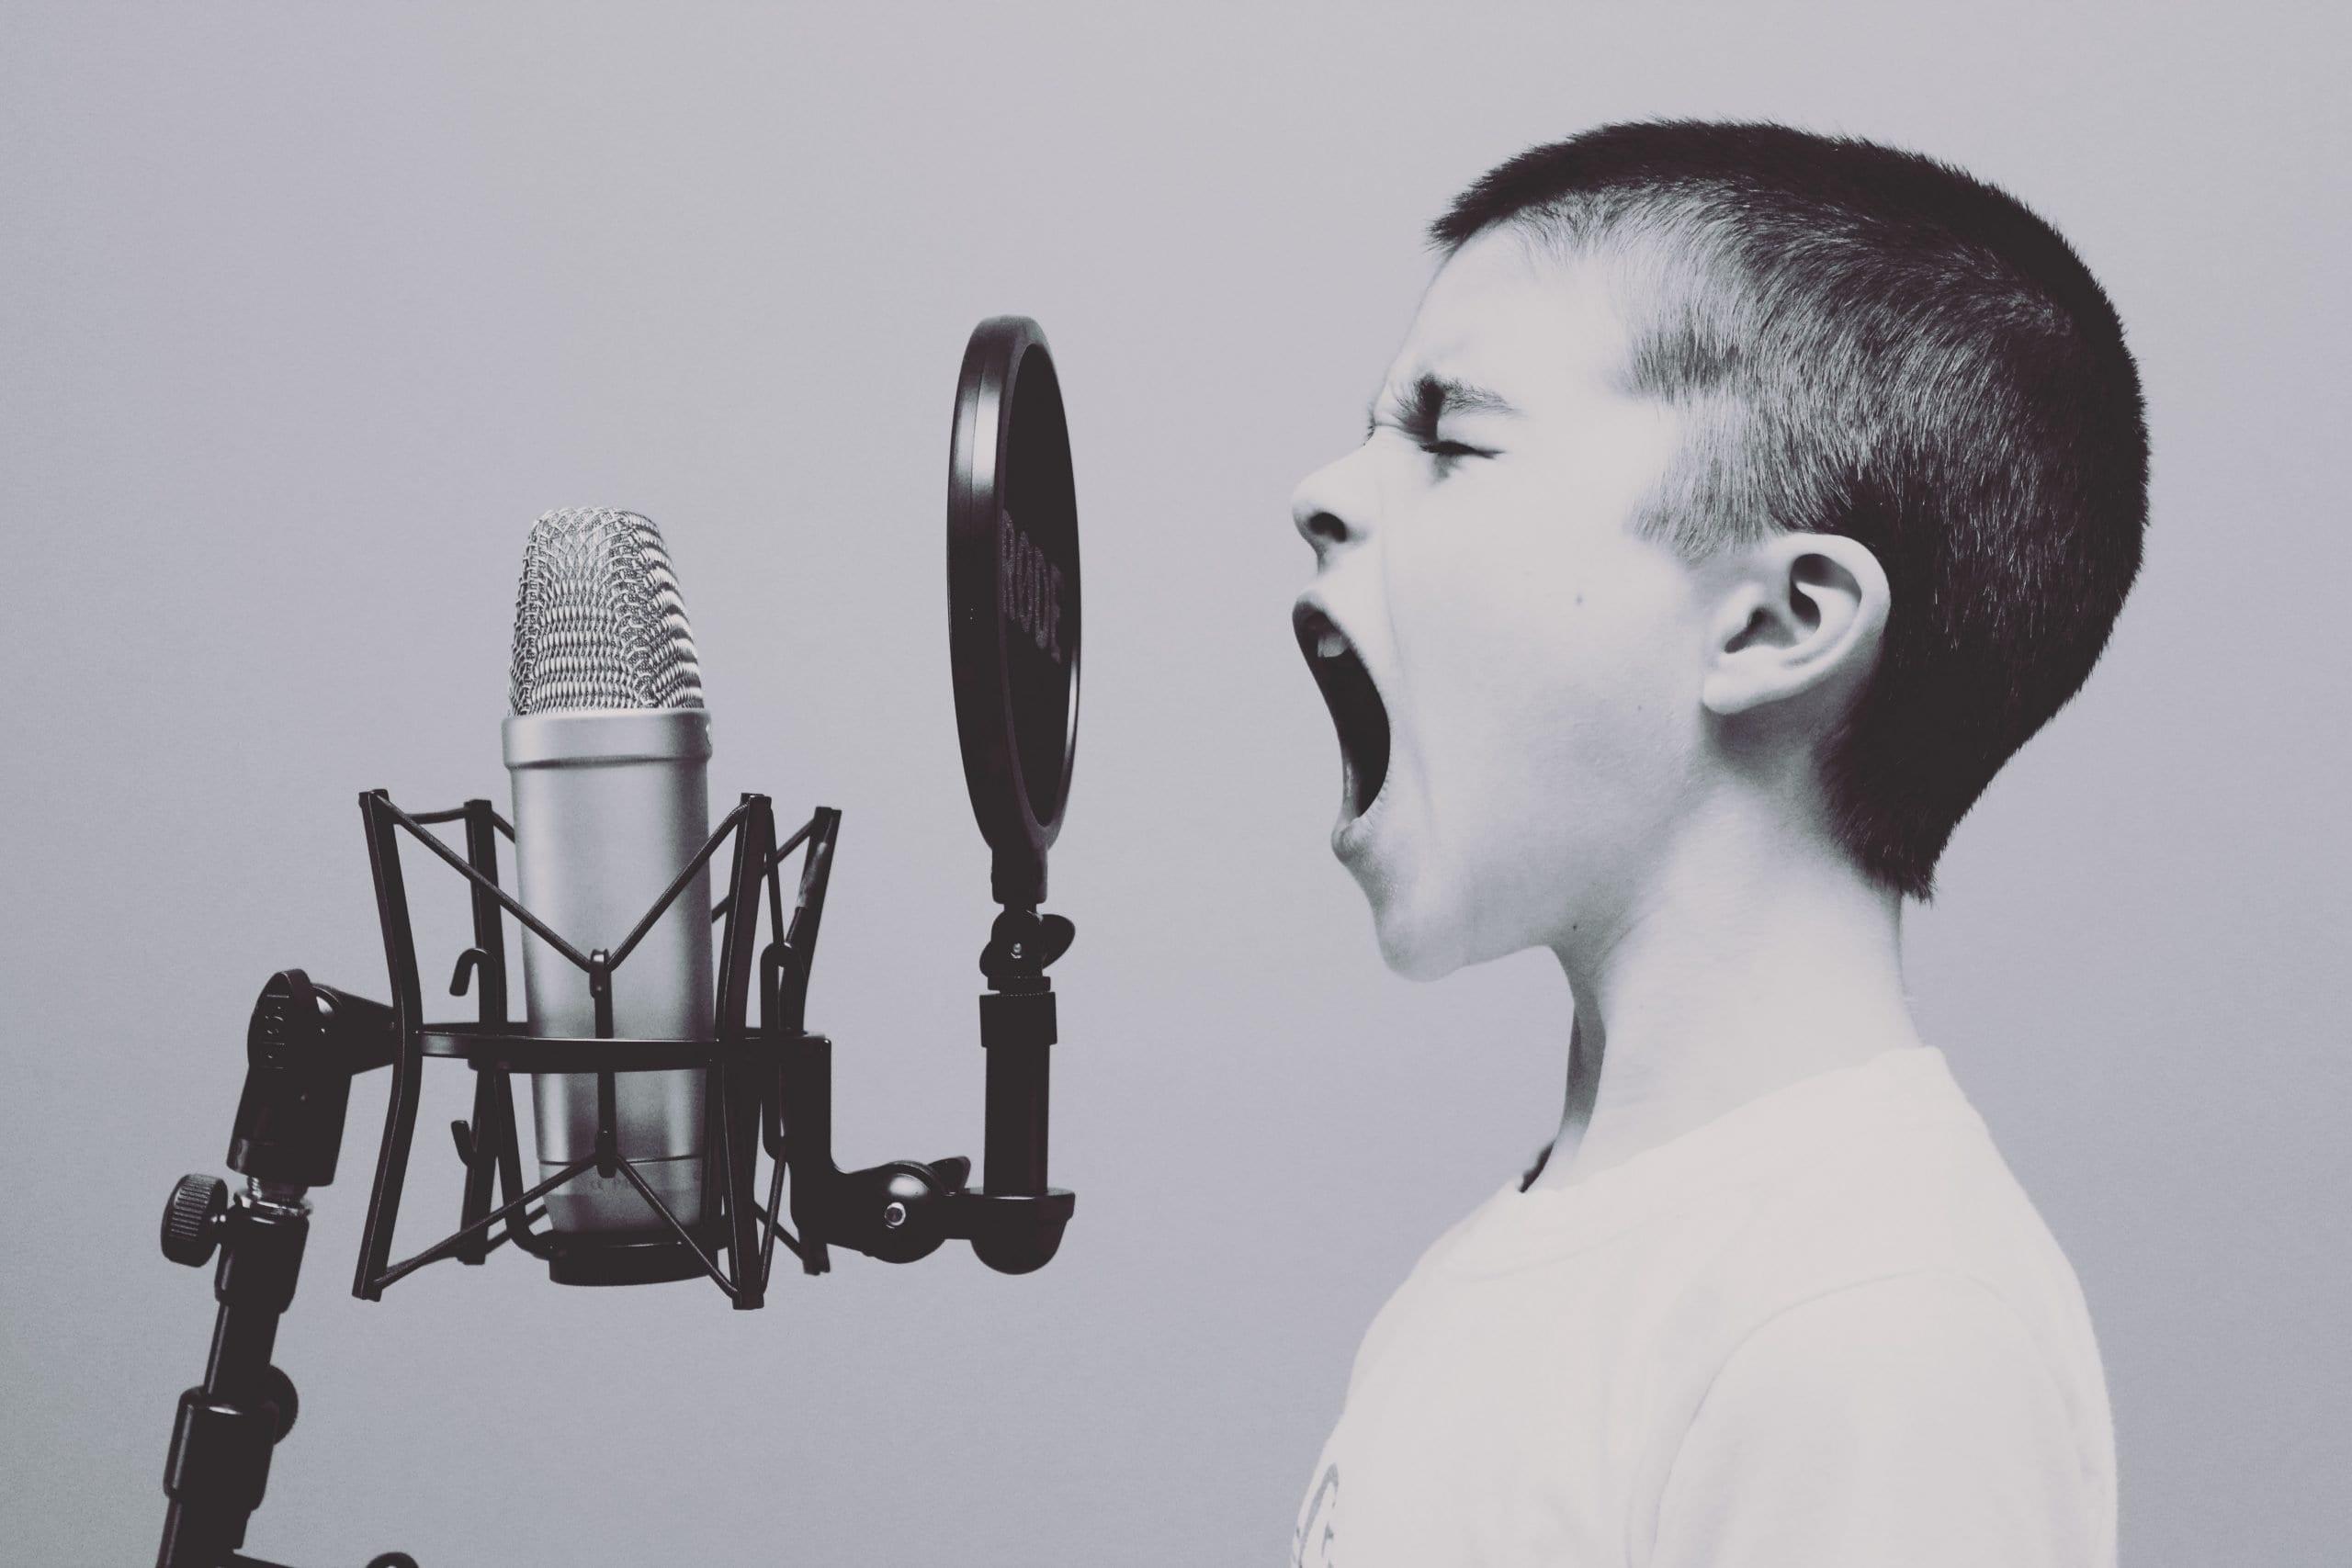 Boy screaming into a mic